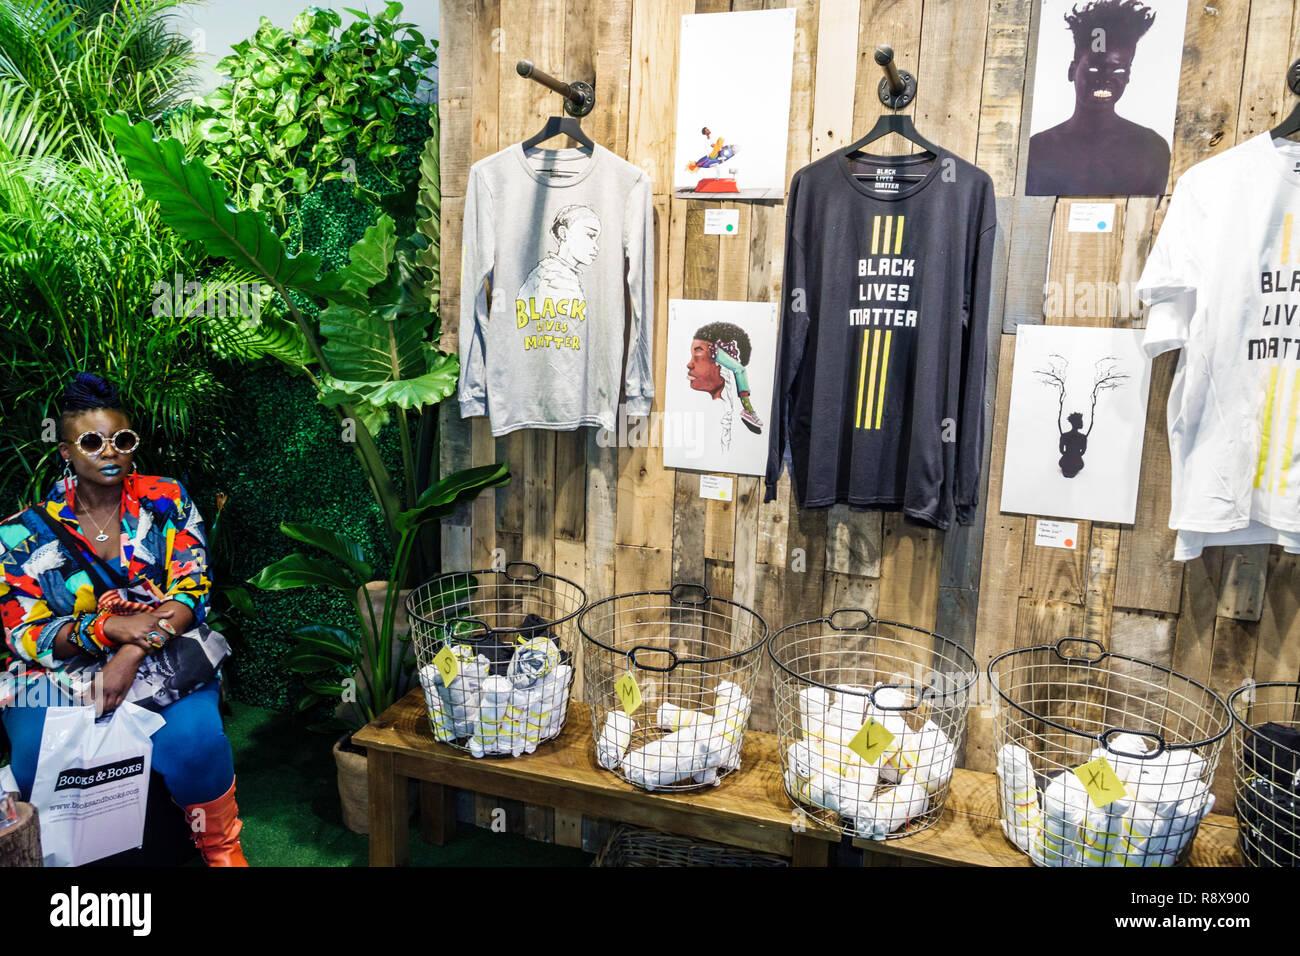 Miami Florida downtown Art Basel Prizm Art Fair inside interior Black Lives Matter pop-up store display sale shirts - Stock Image